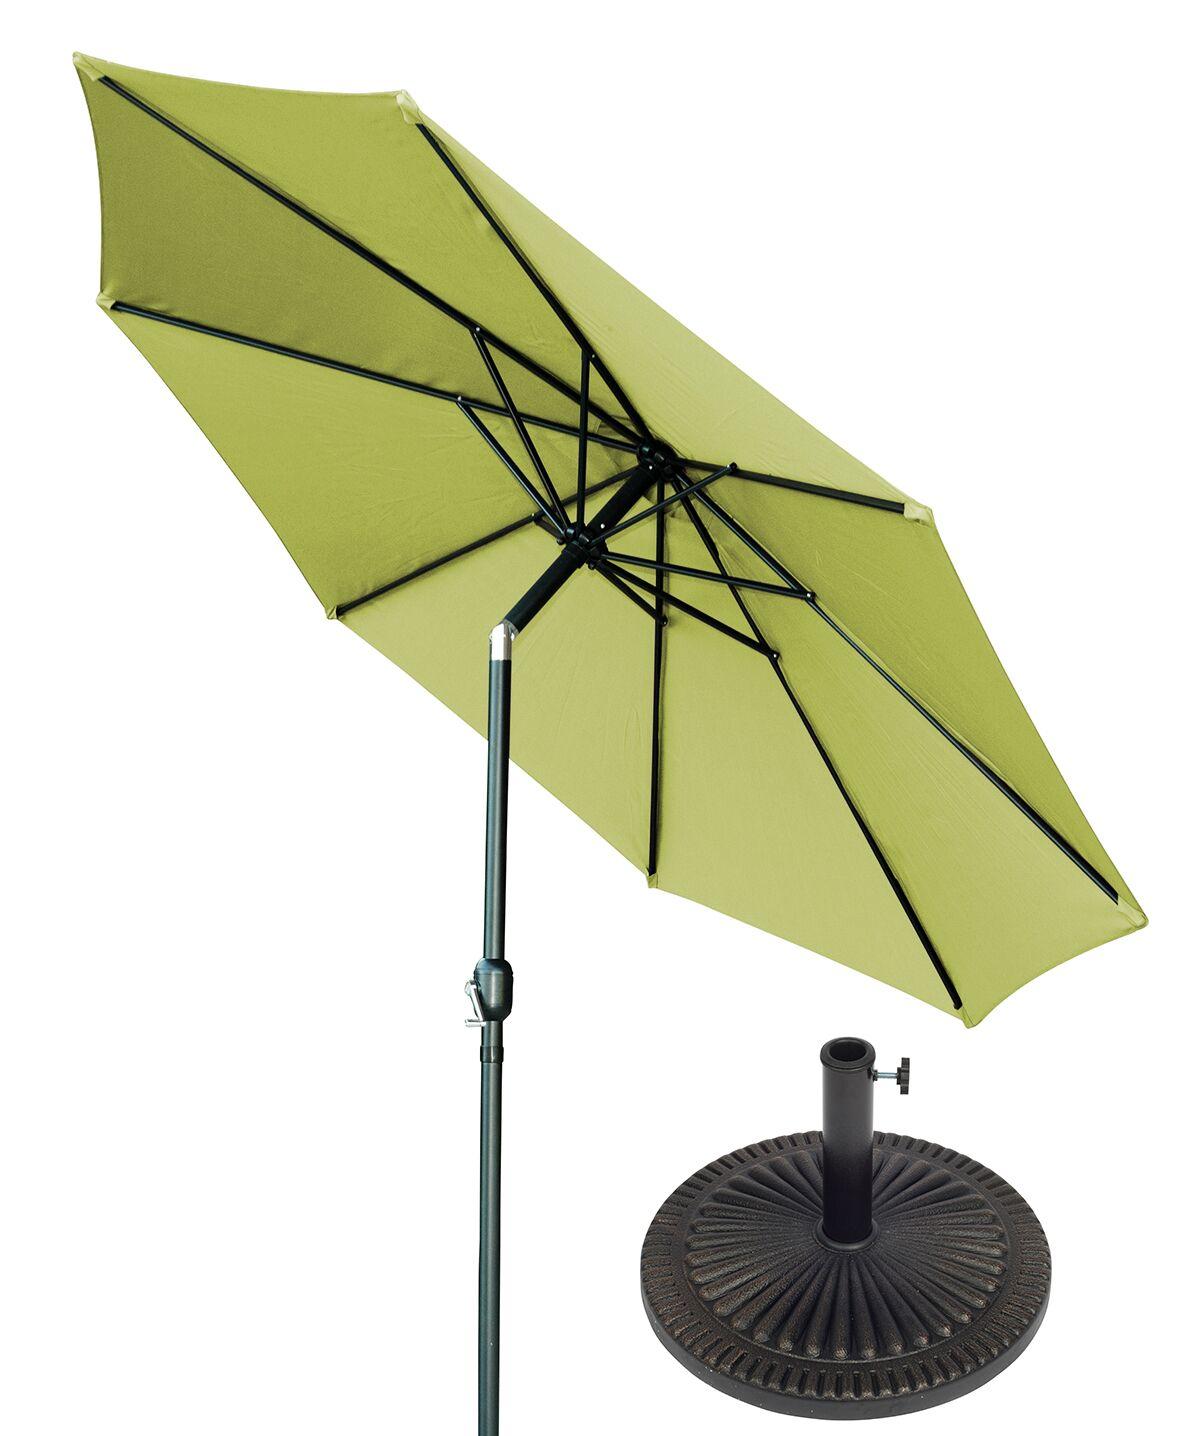 10' Market Umbrella Fabric: Light Green